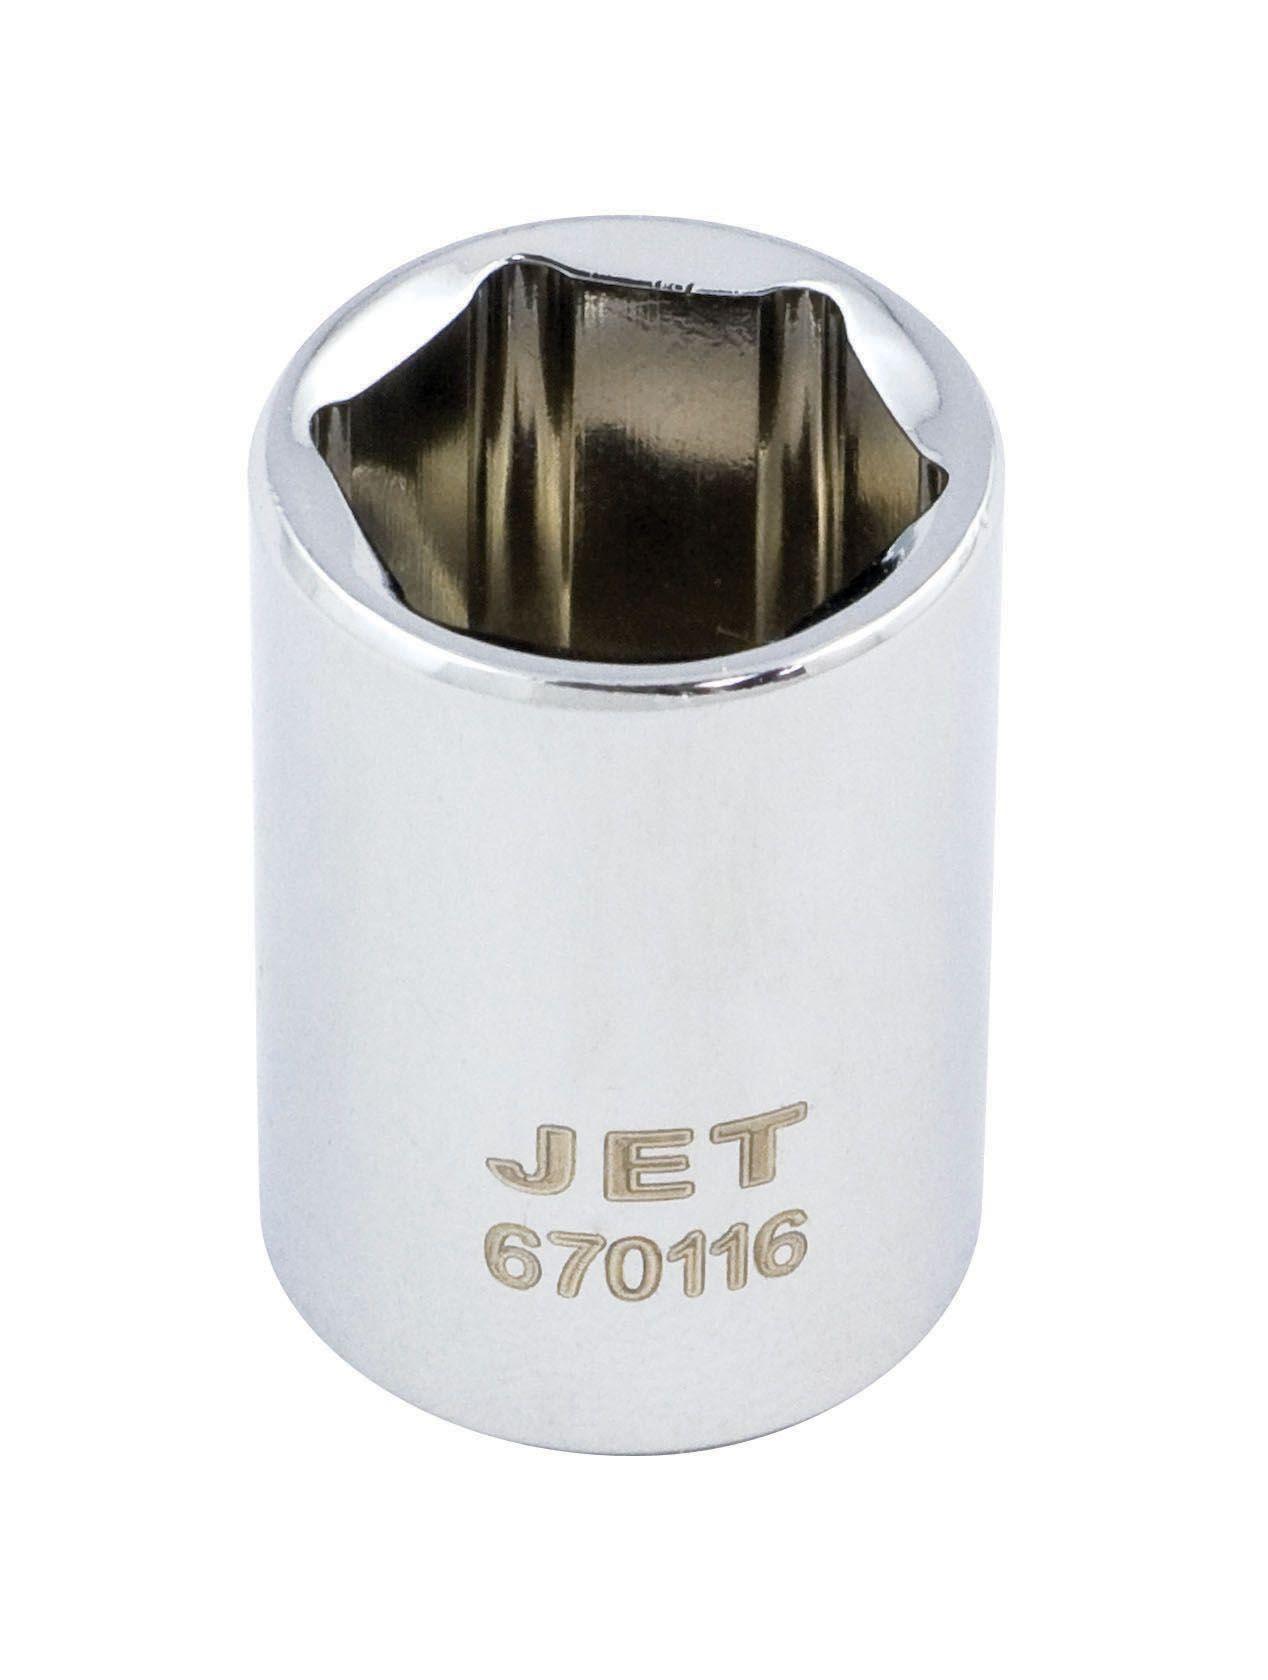 Jet 670109 Douille 9/32